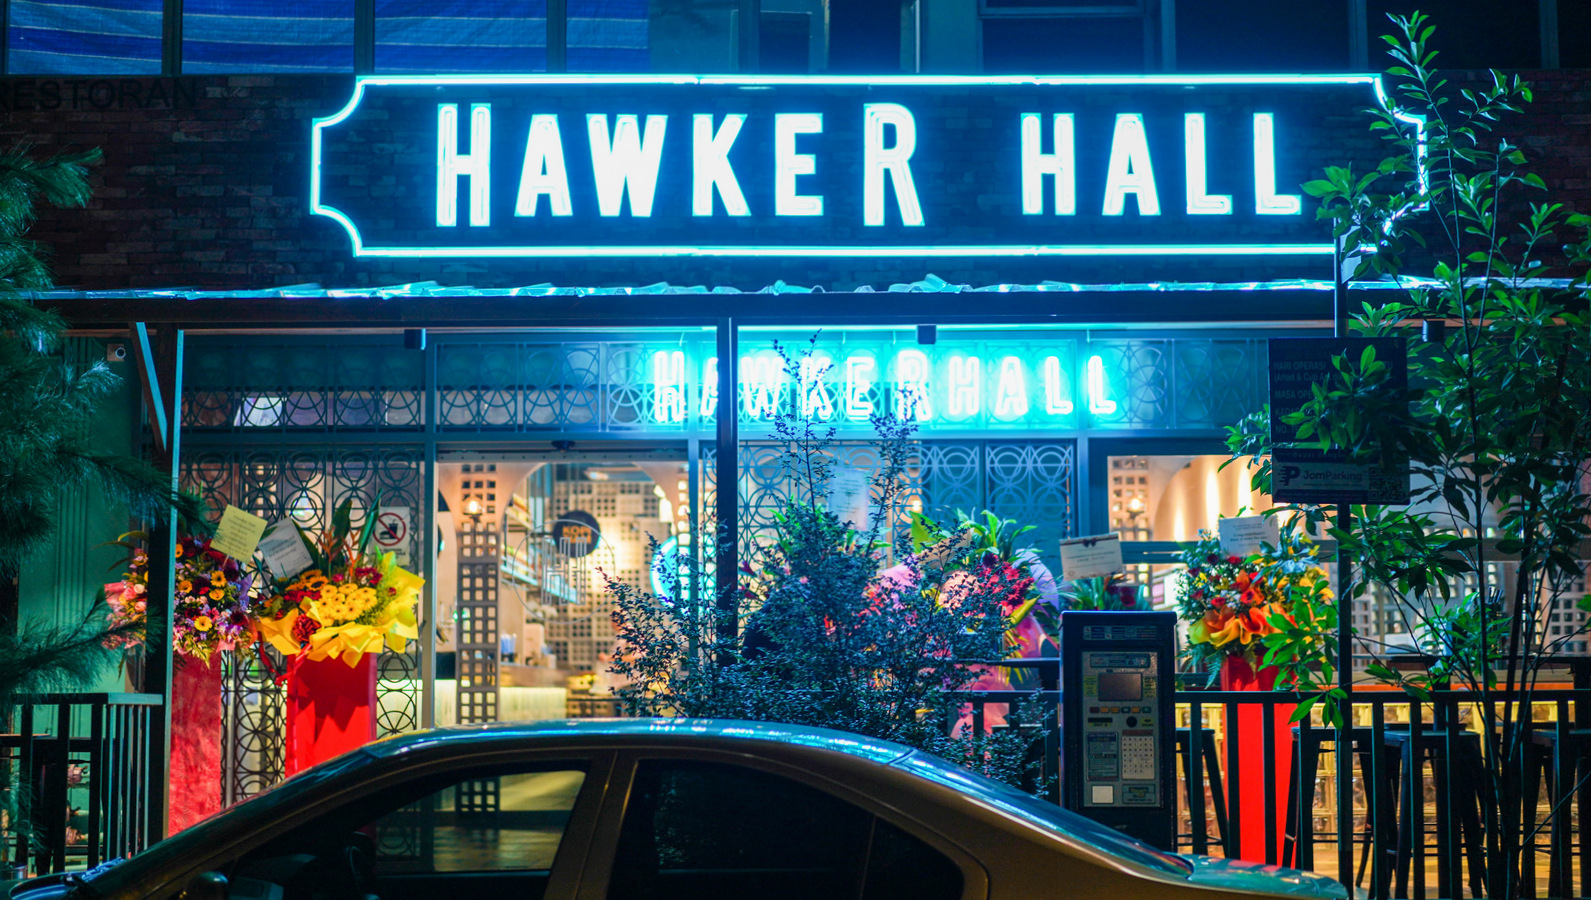 hawker hall, sri hartamas